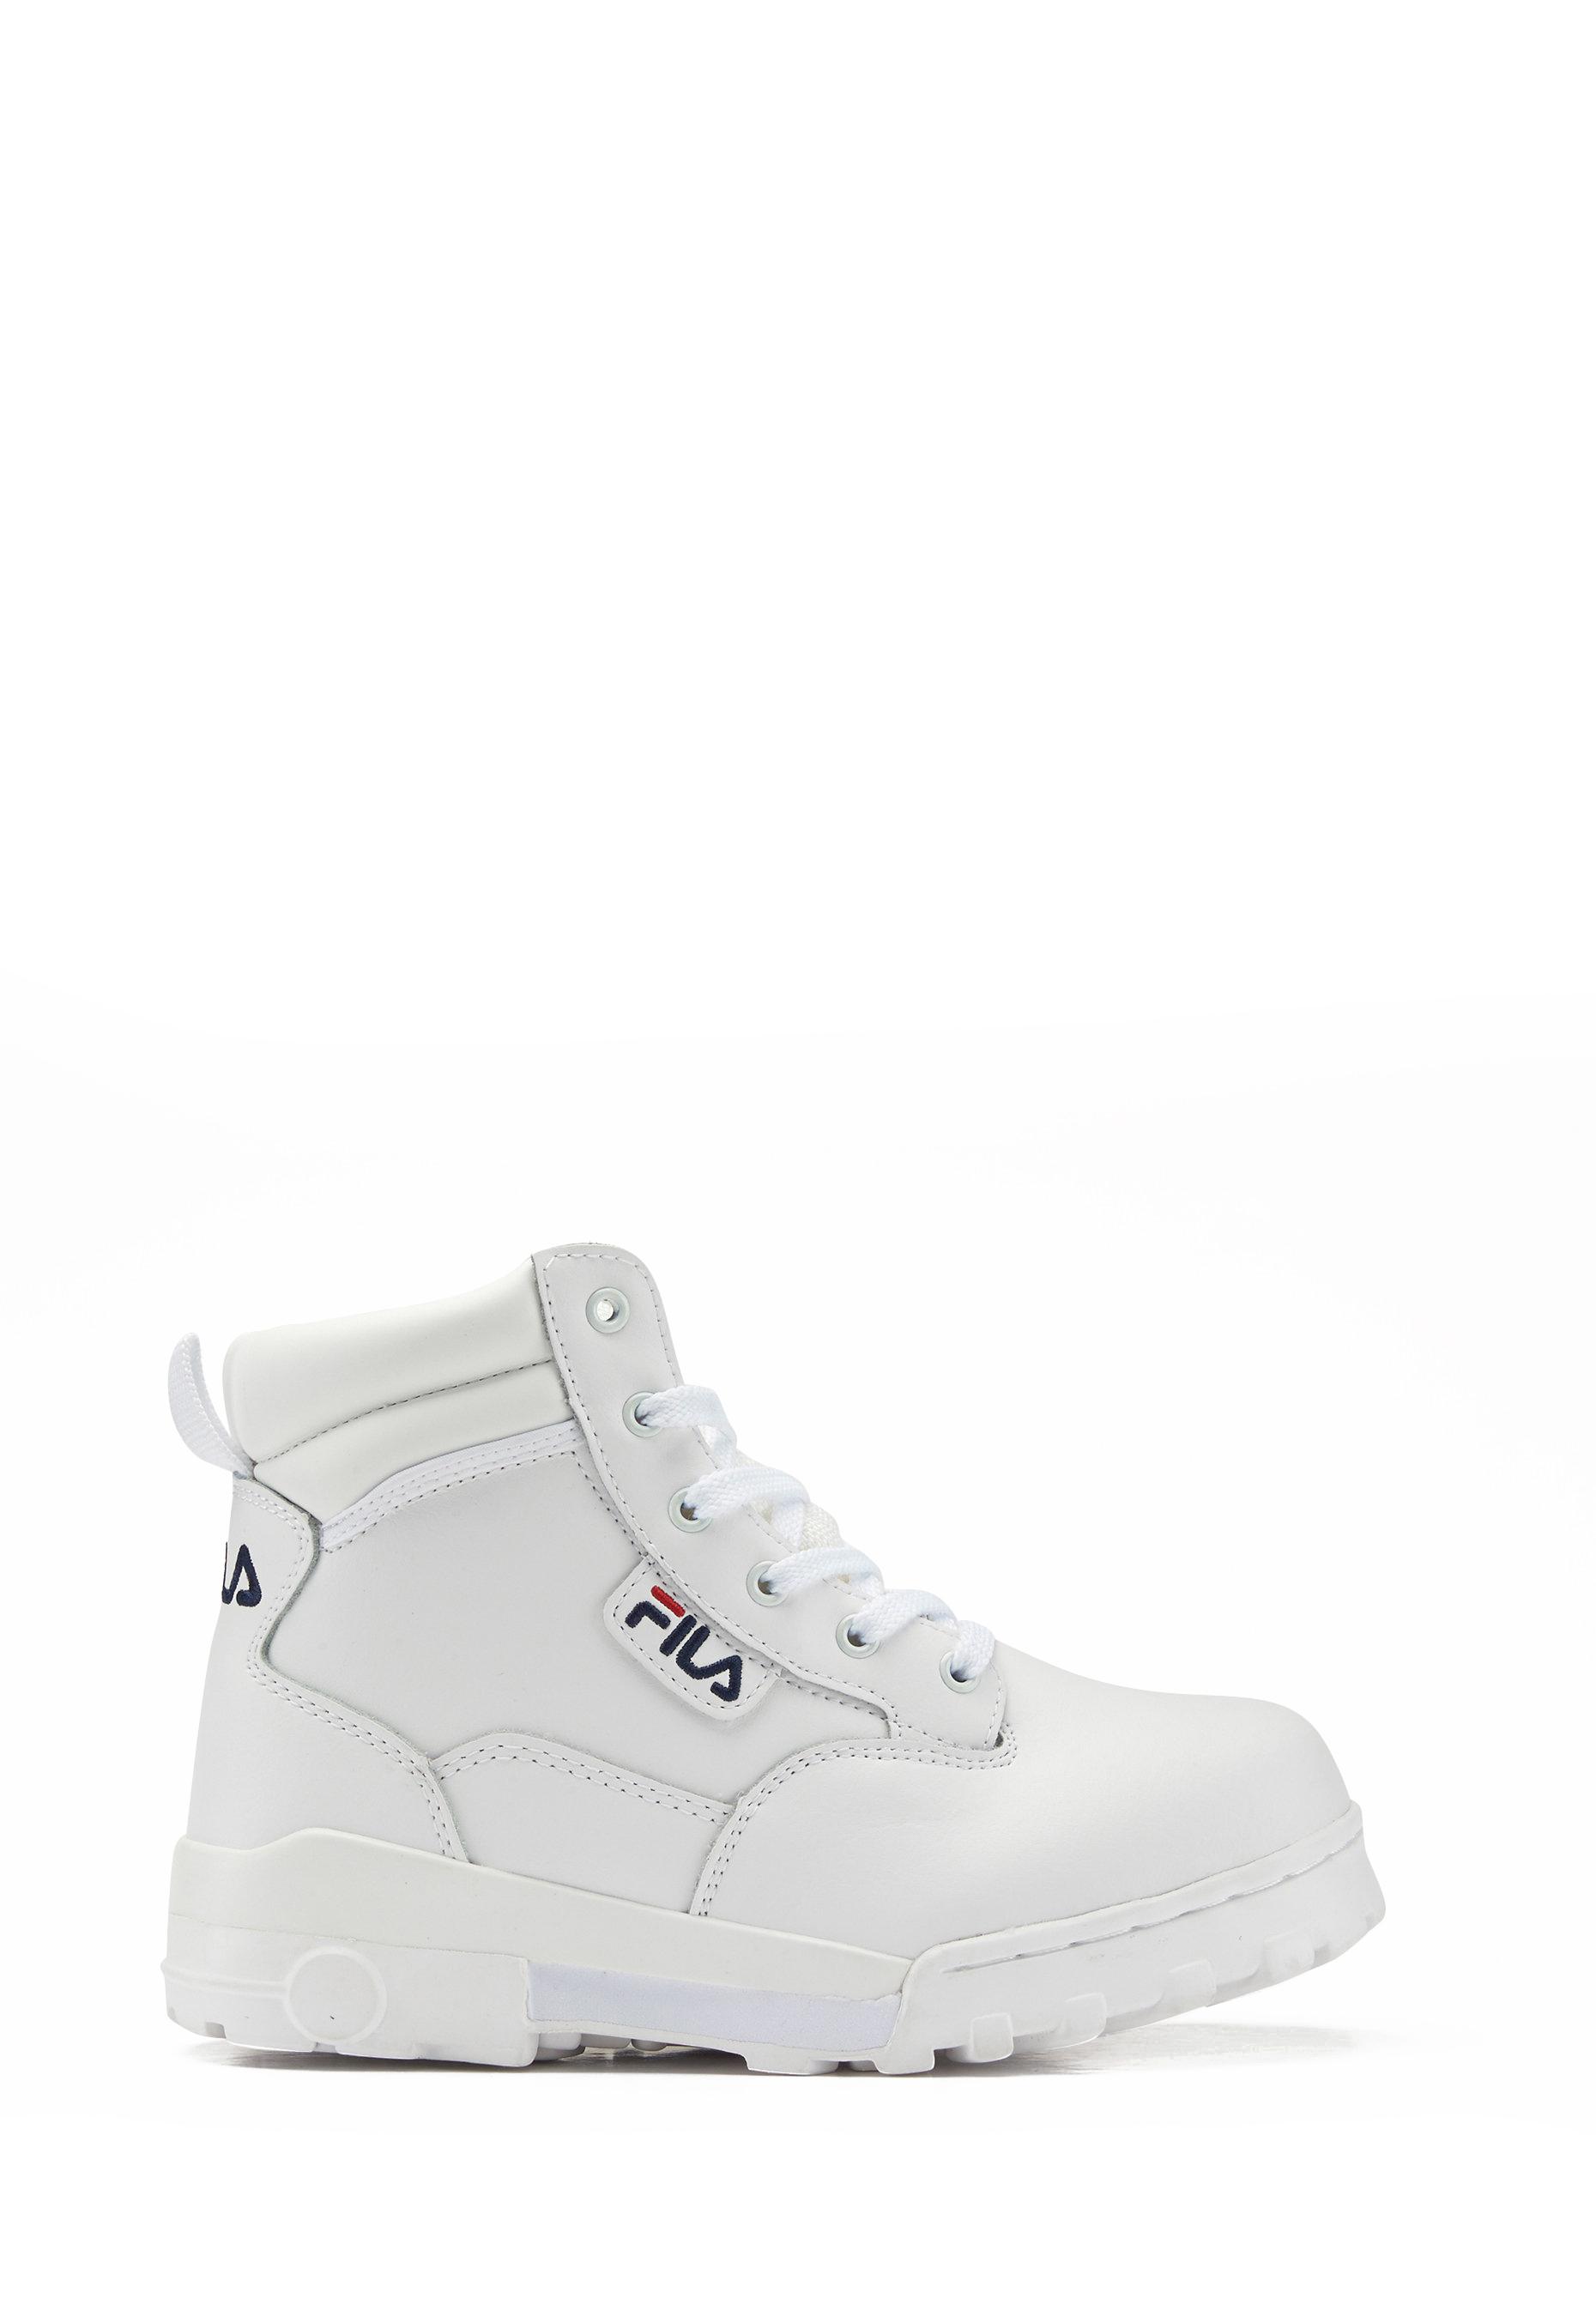 FILA Grunge Mid Boots White - Bubbleroom